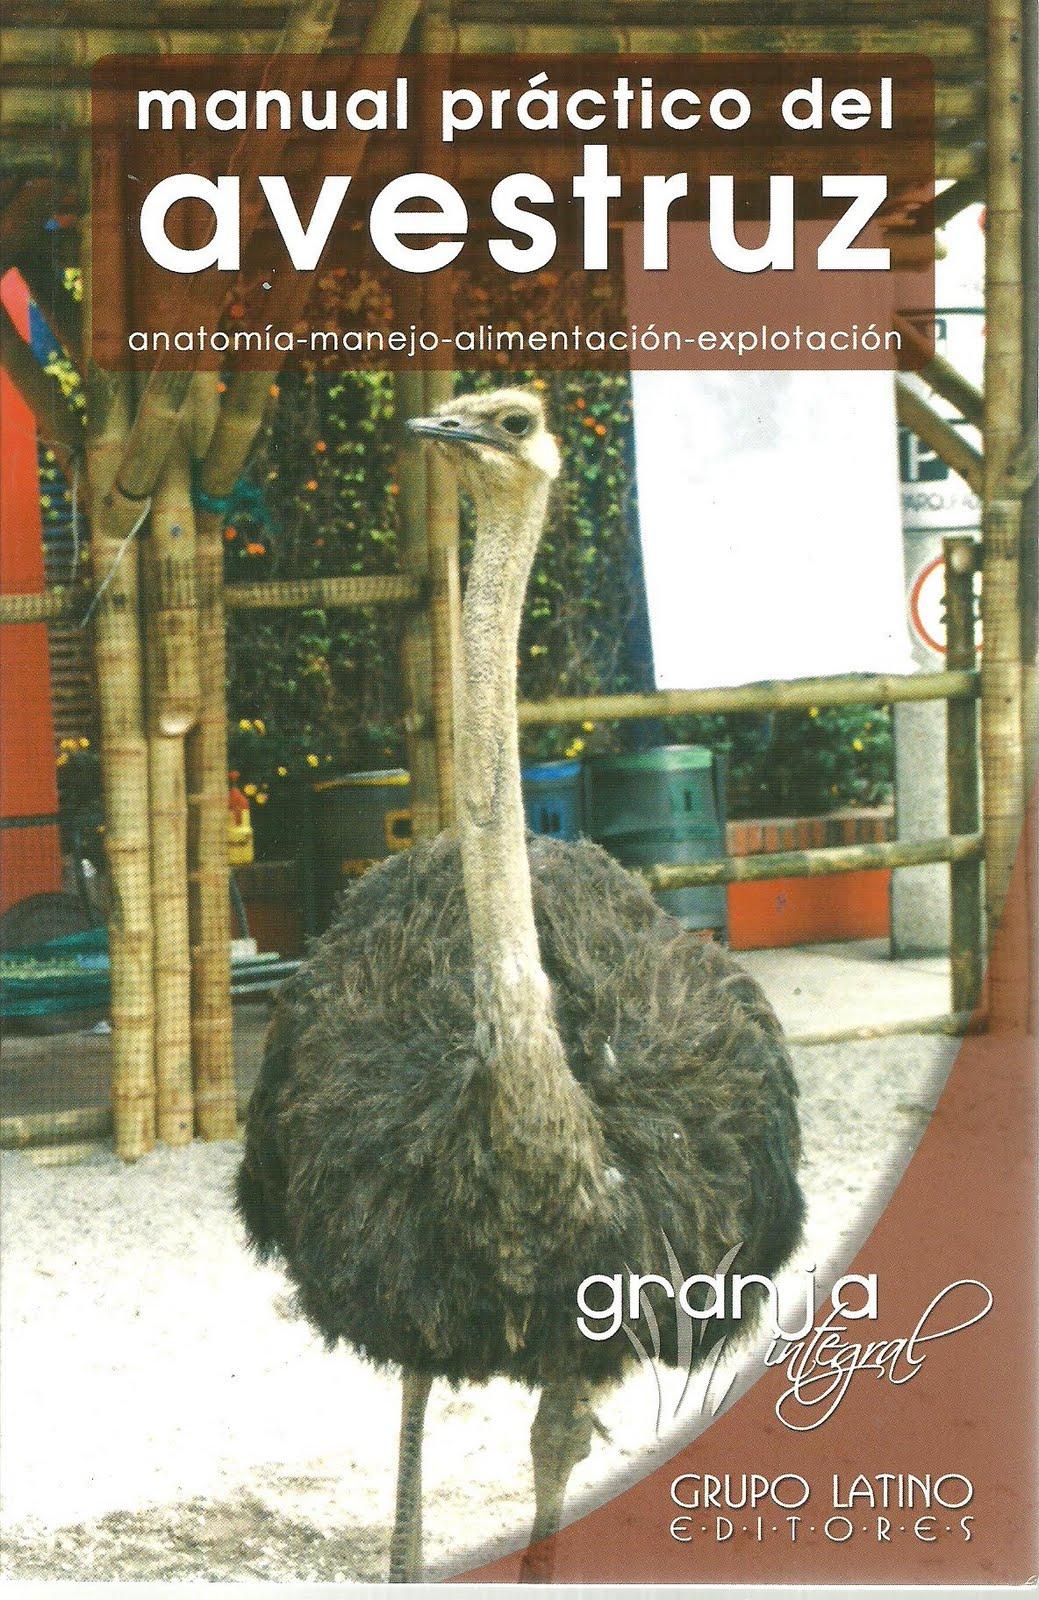 LIBROS DVDS CD-ROMS ENCICLOPEDIAS EDUCACIÓN PREESCOLAR PRIMARIA ...